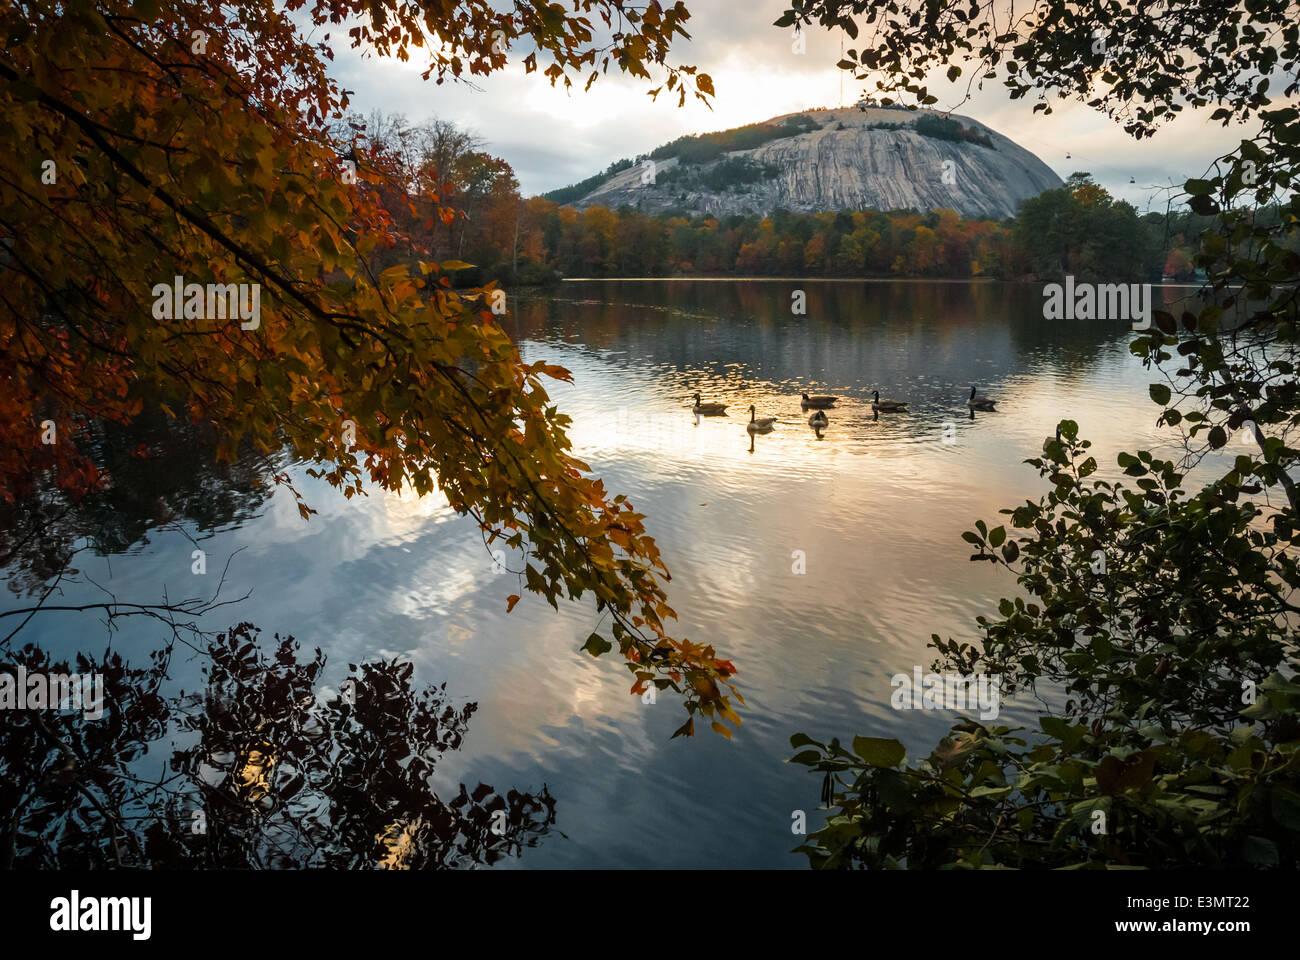 Ducks Glide Across A Still Lake At Stone Mountain Park Near Atlanta